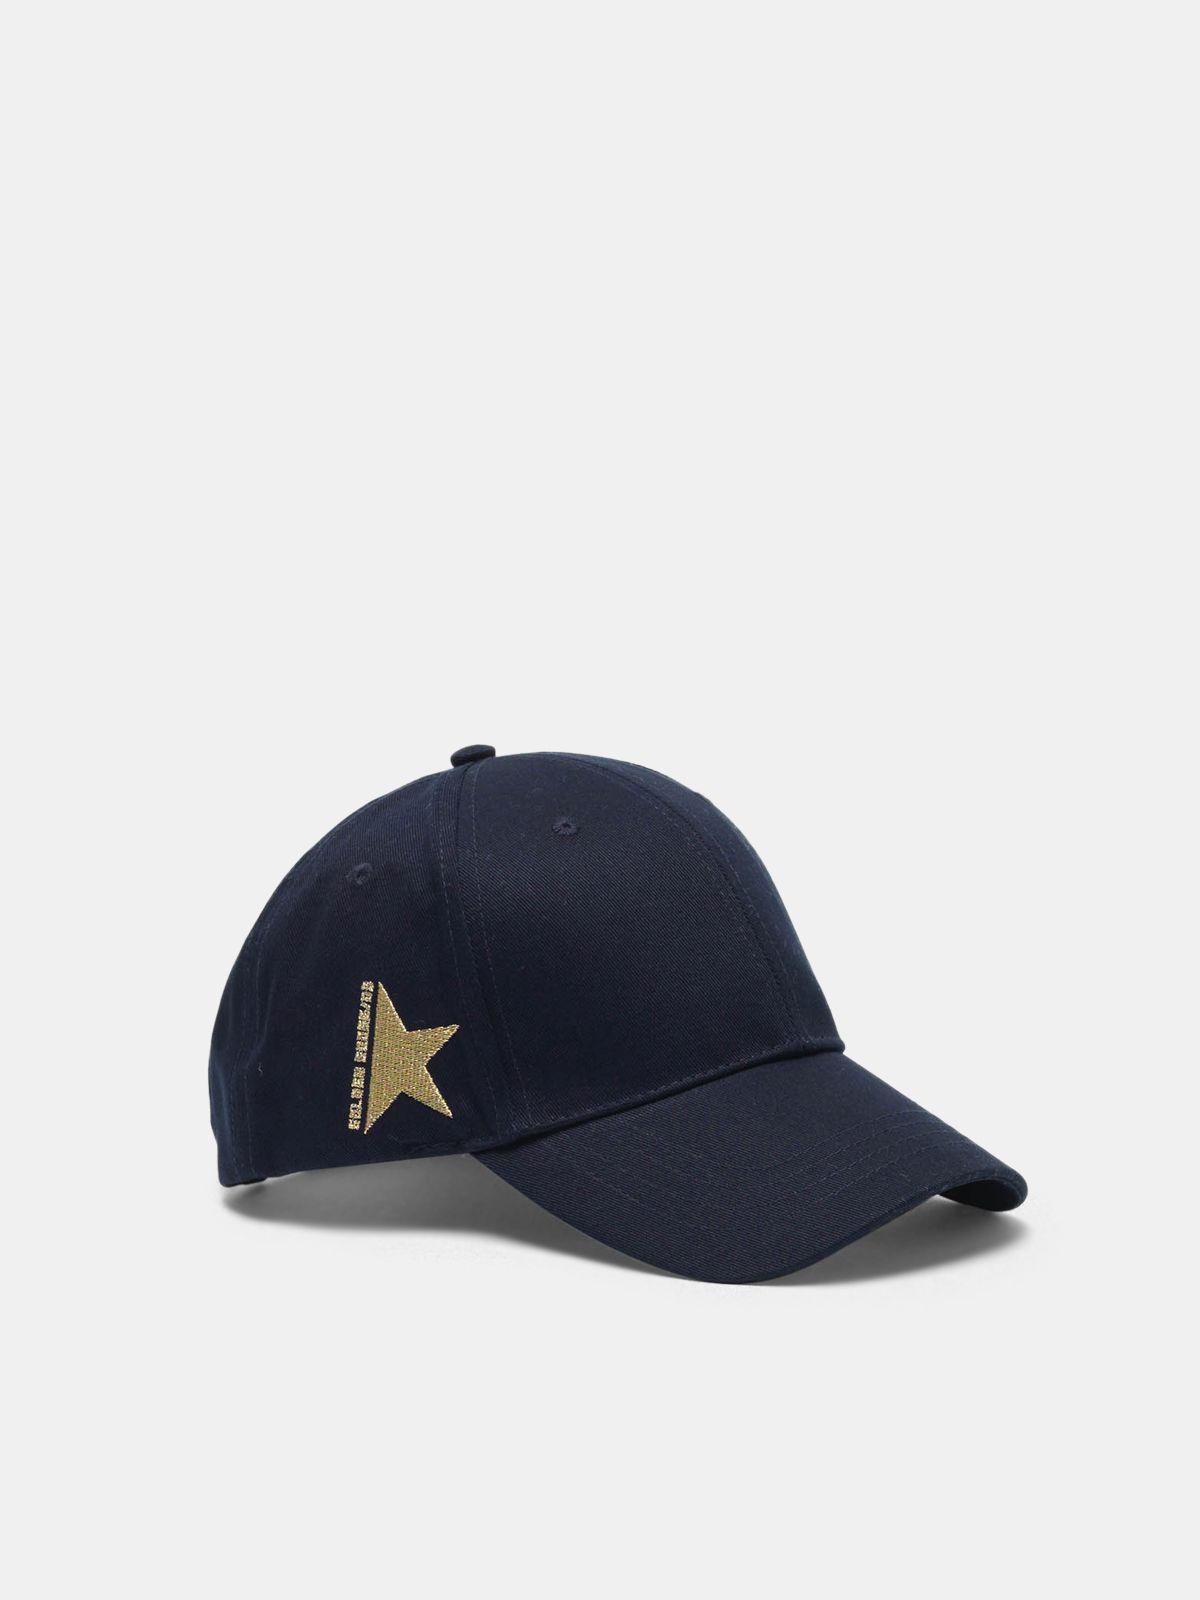 Golden Goose - Aki baseball cap in cotton drill in